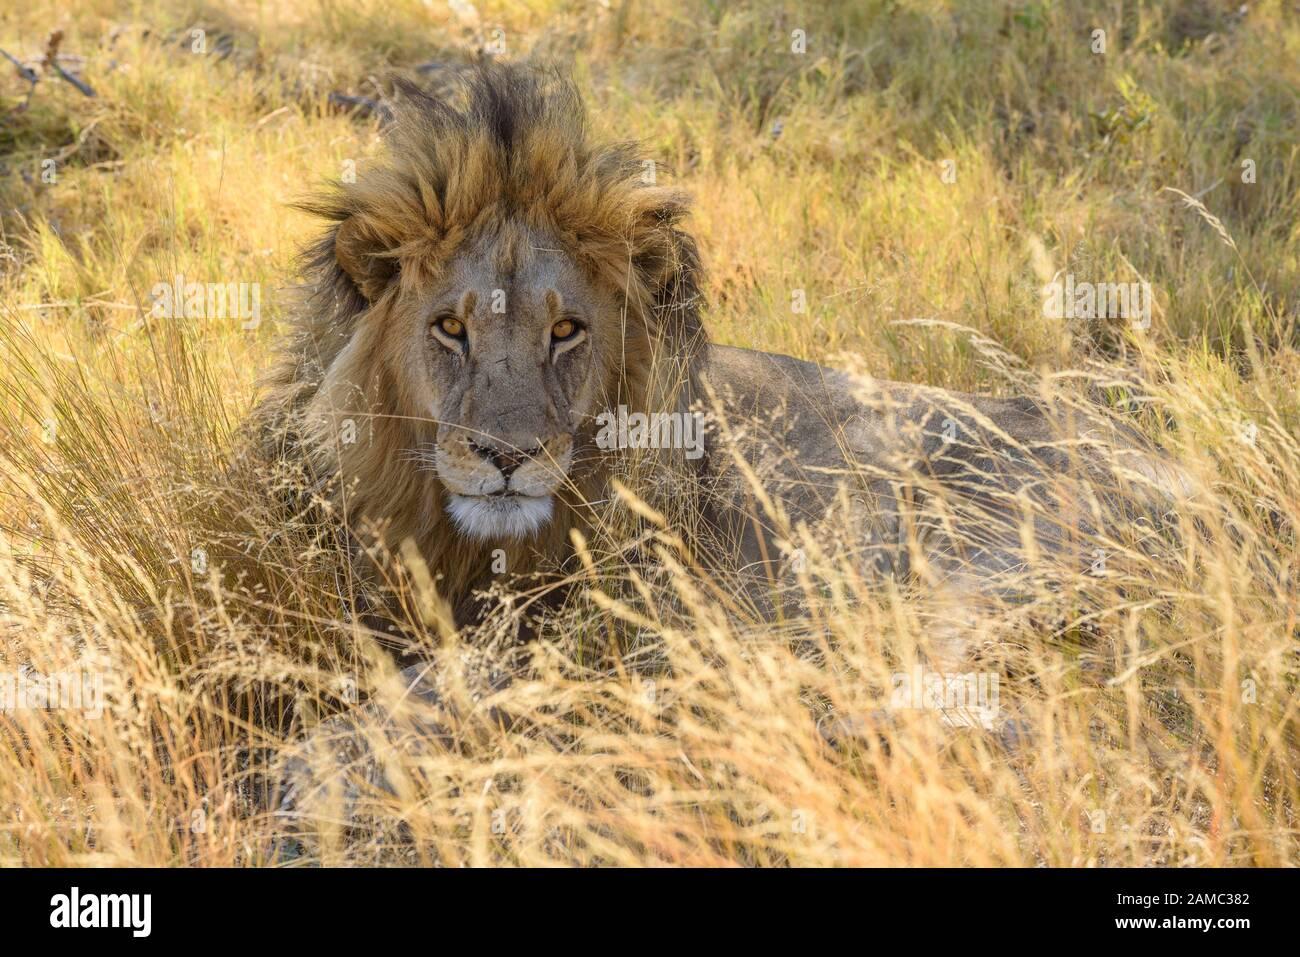 Male Lion, Panthera leo, in long grass, Macatoo, Okavango Delta, Botswana Stock Photo